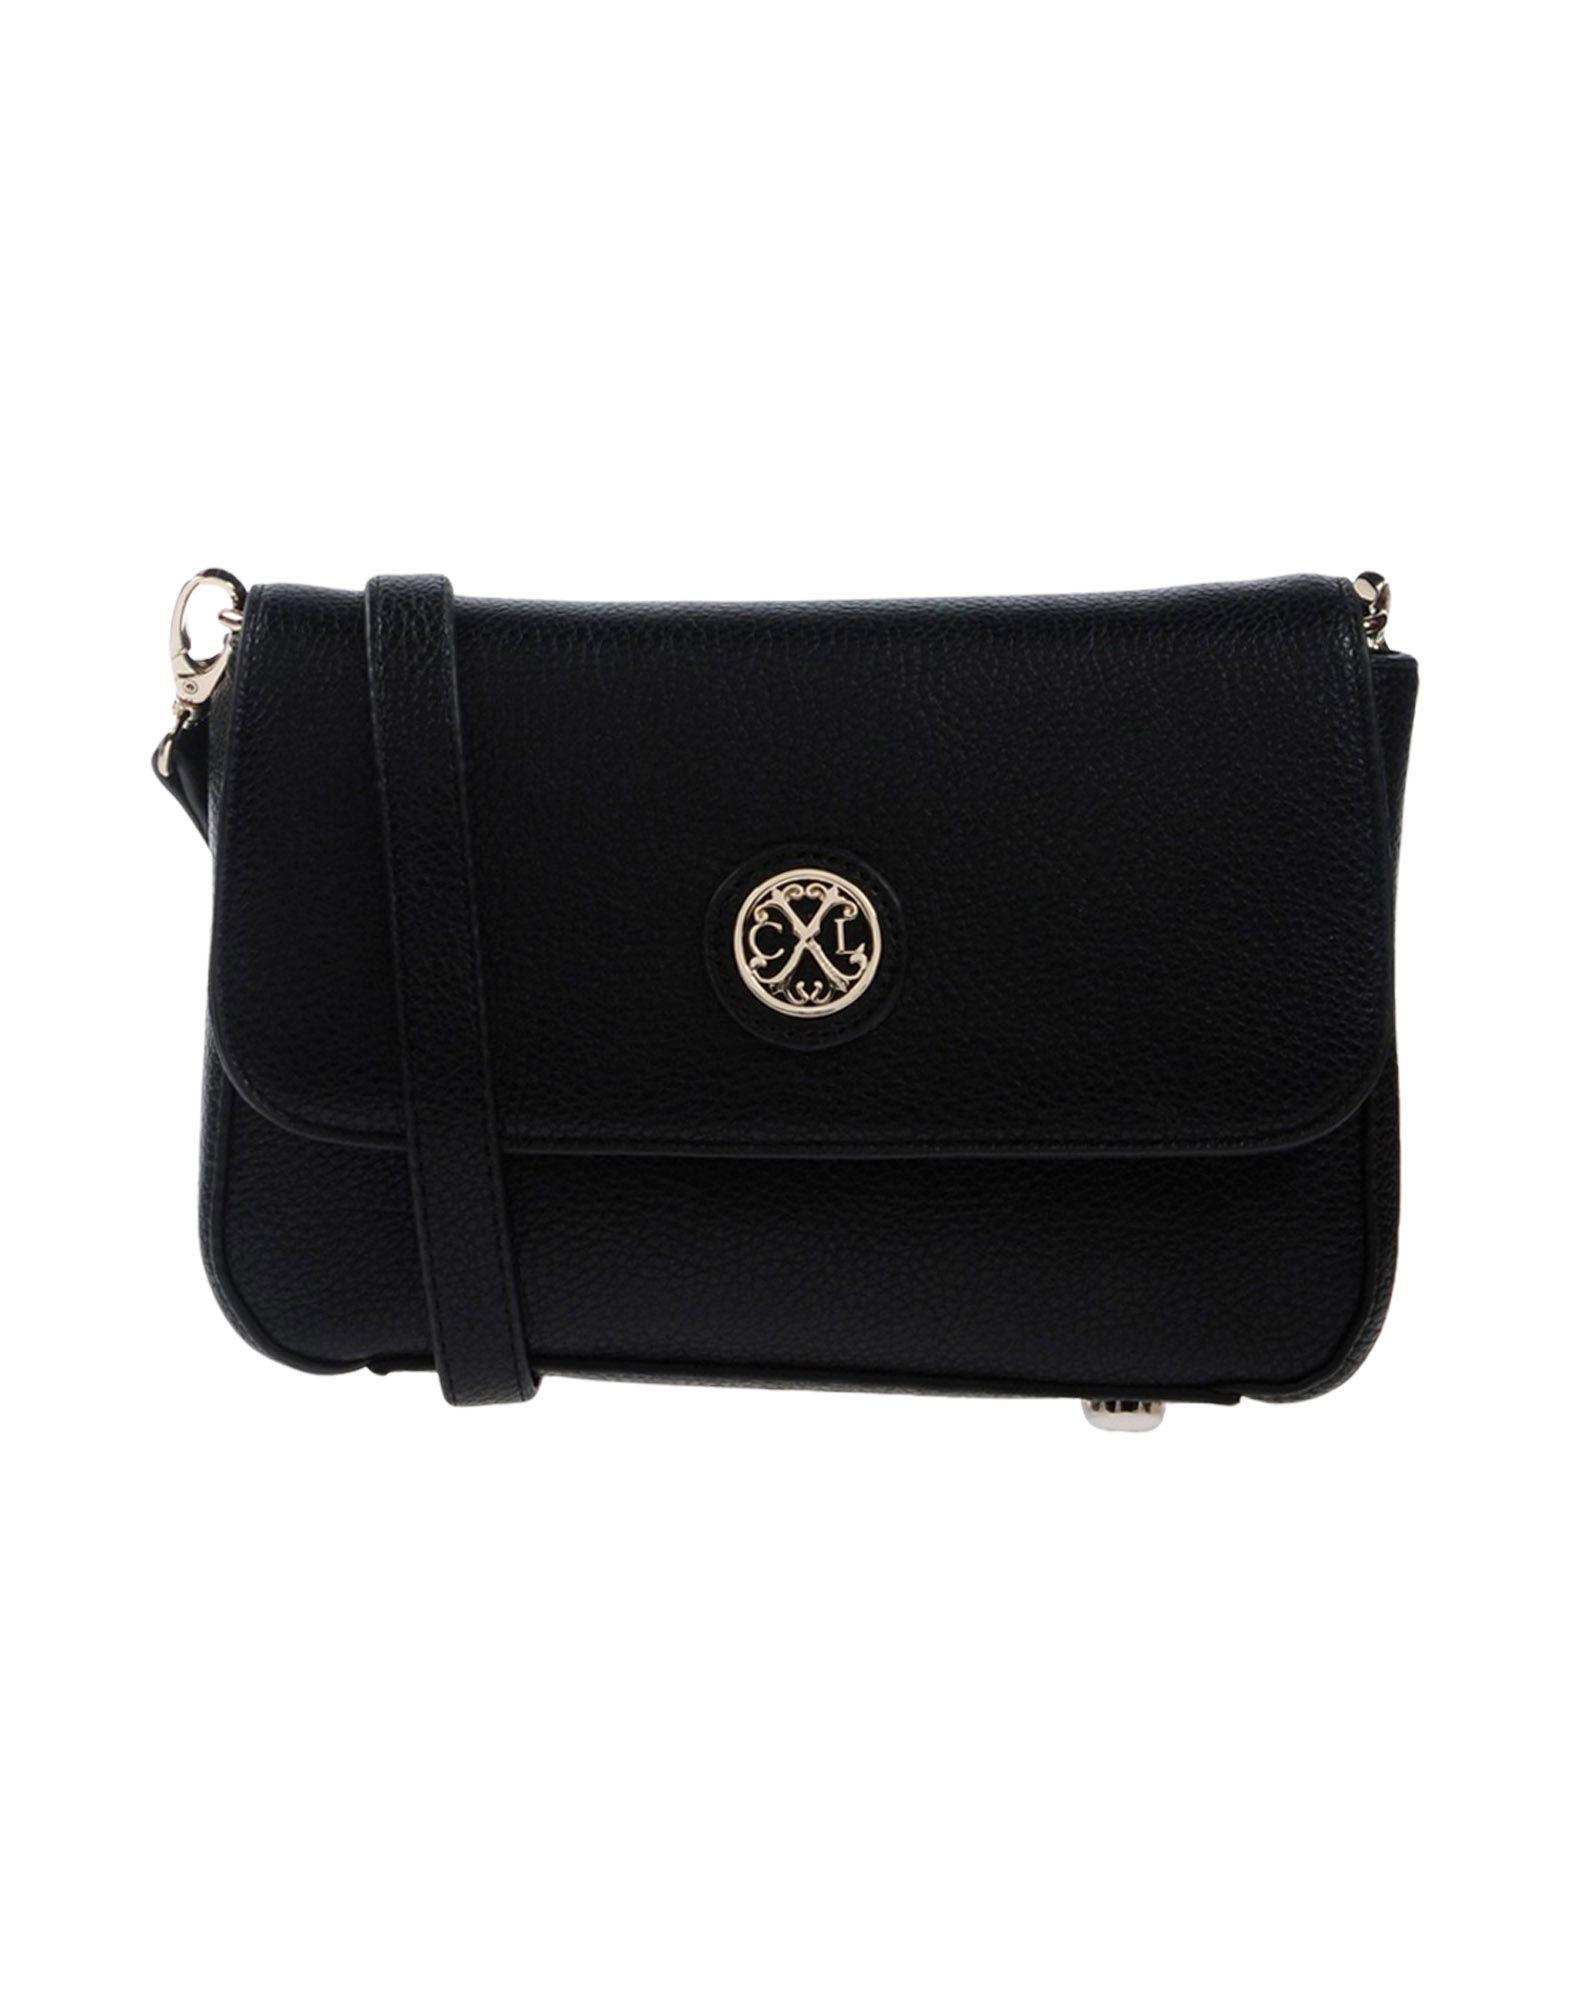 CHRISTIAN LACROIX Handbag in Black